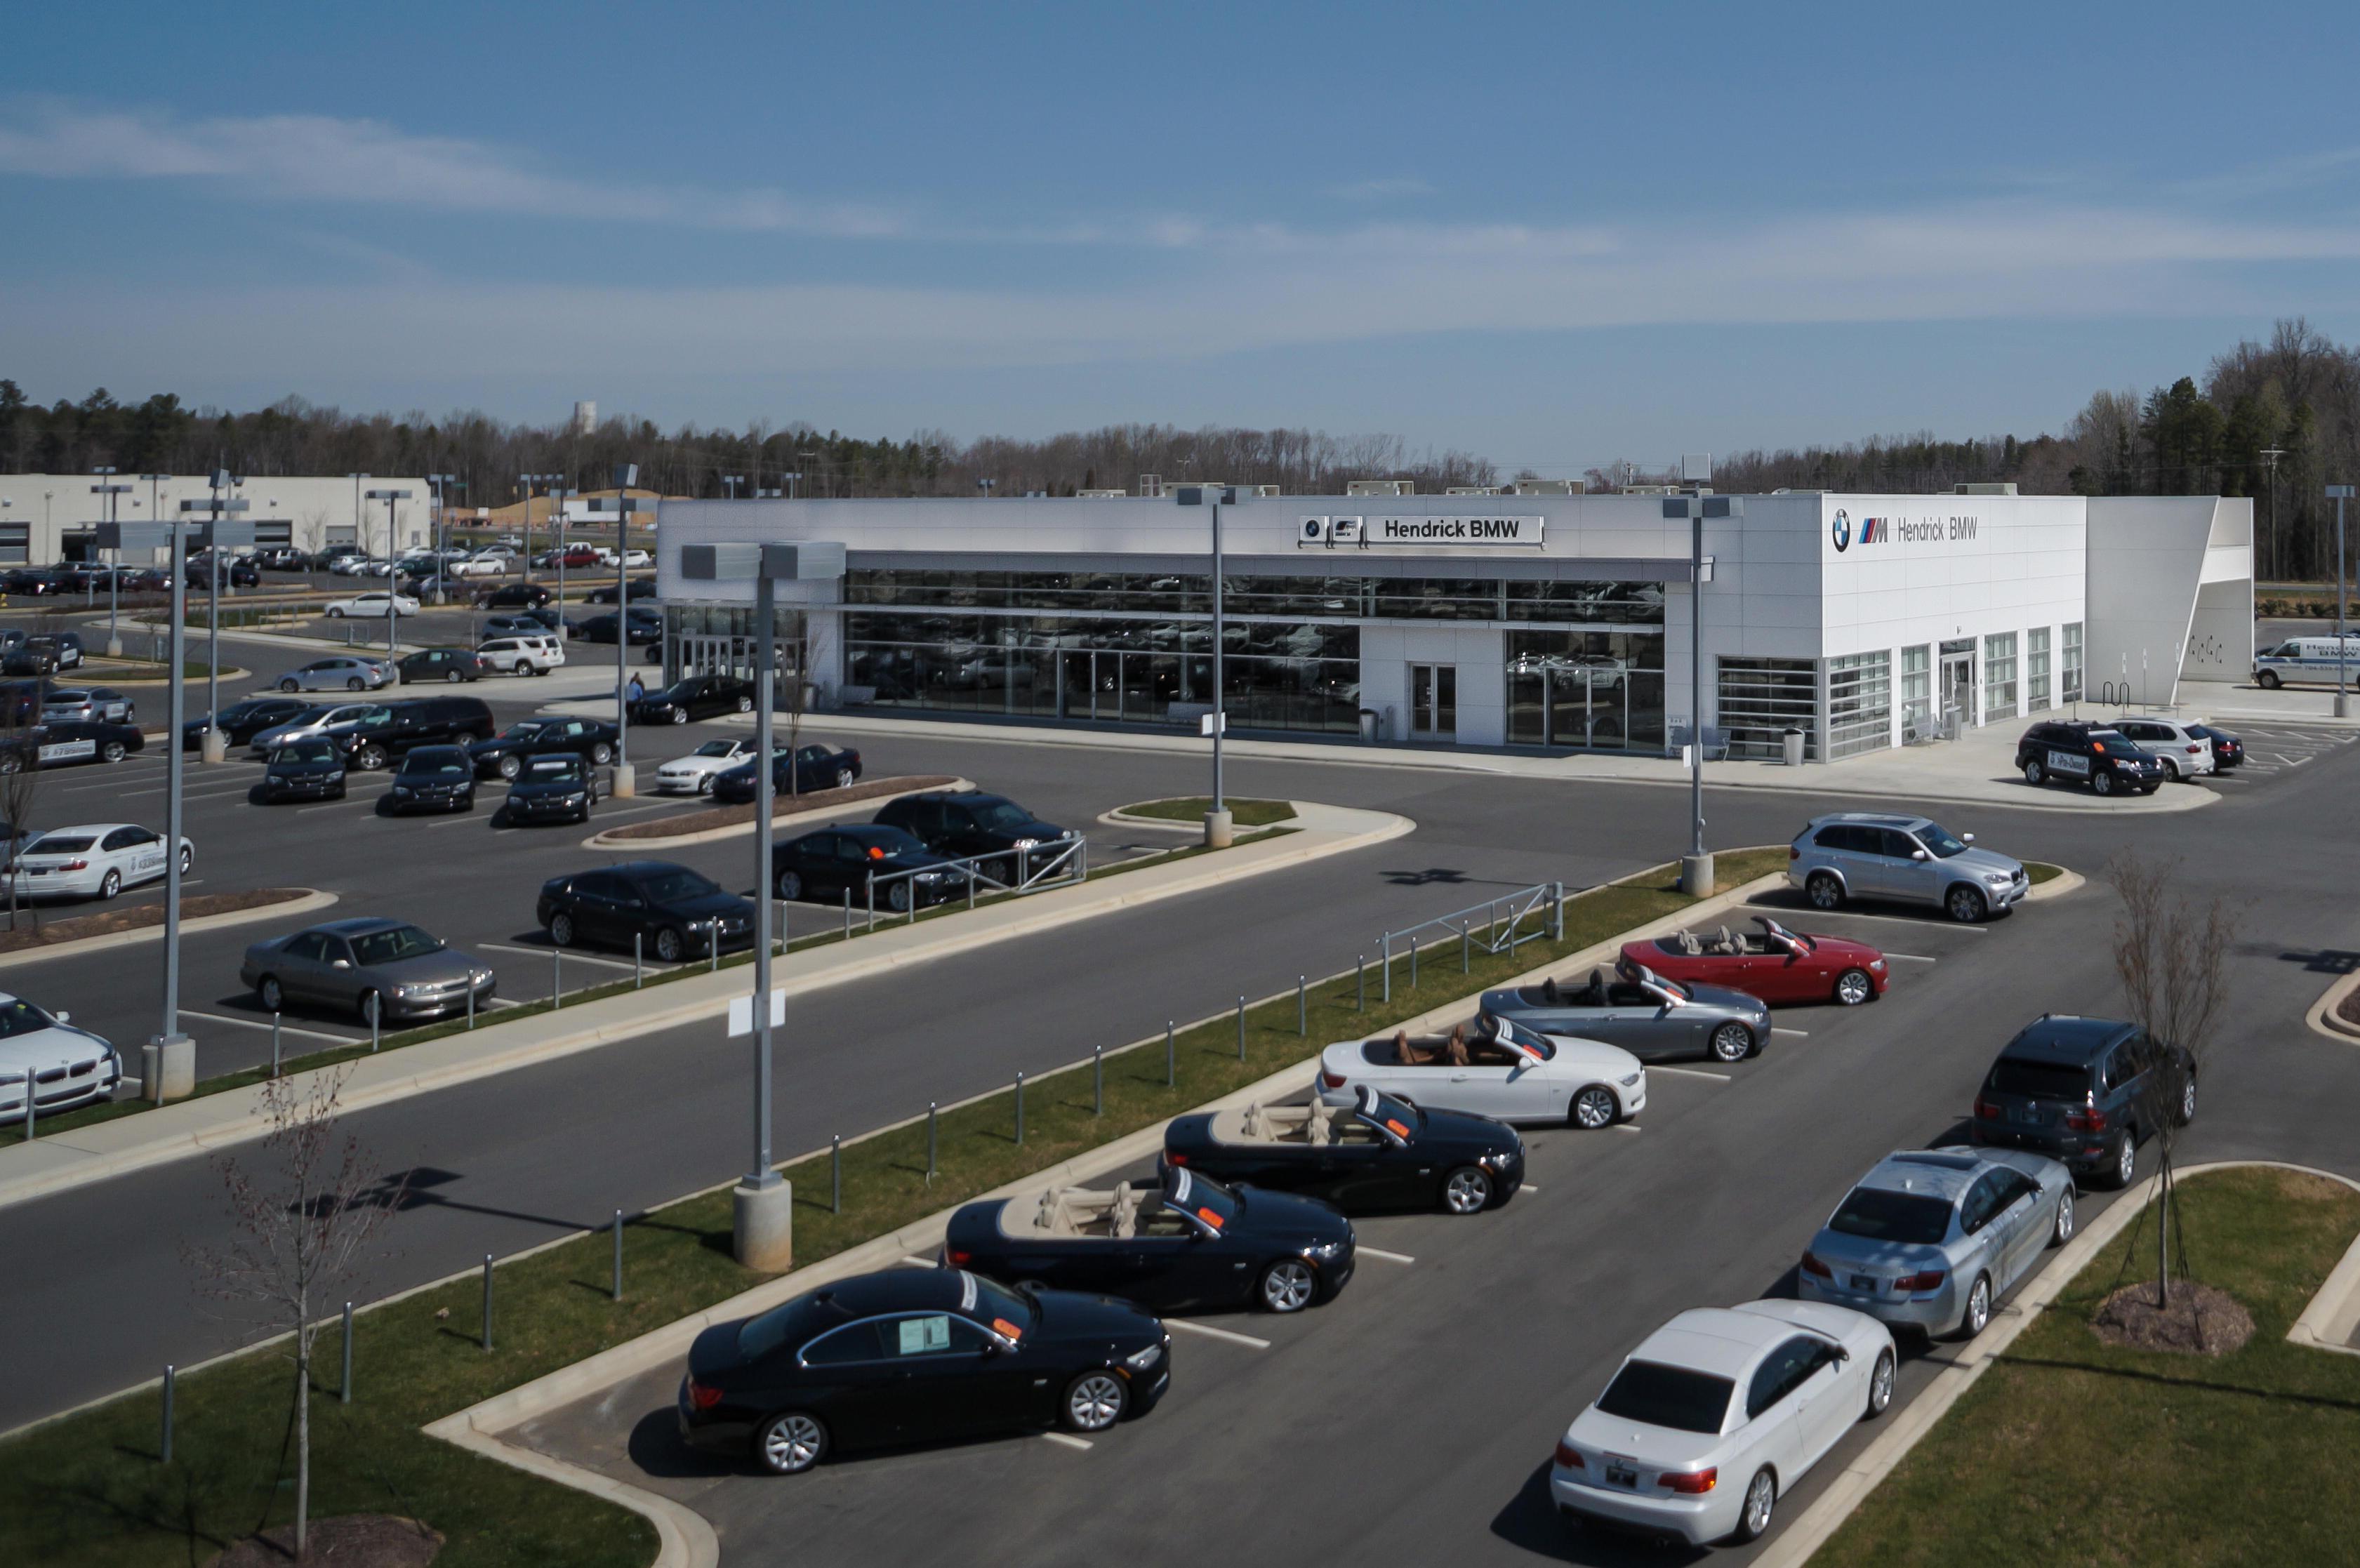 Hendrick Bmw Northlake 10720 Northlake Auto Plaza Blvd Charlotte Nc Auto Dealers Mapquest